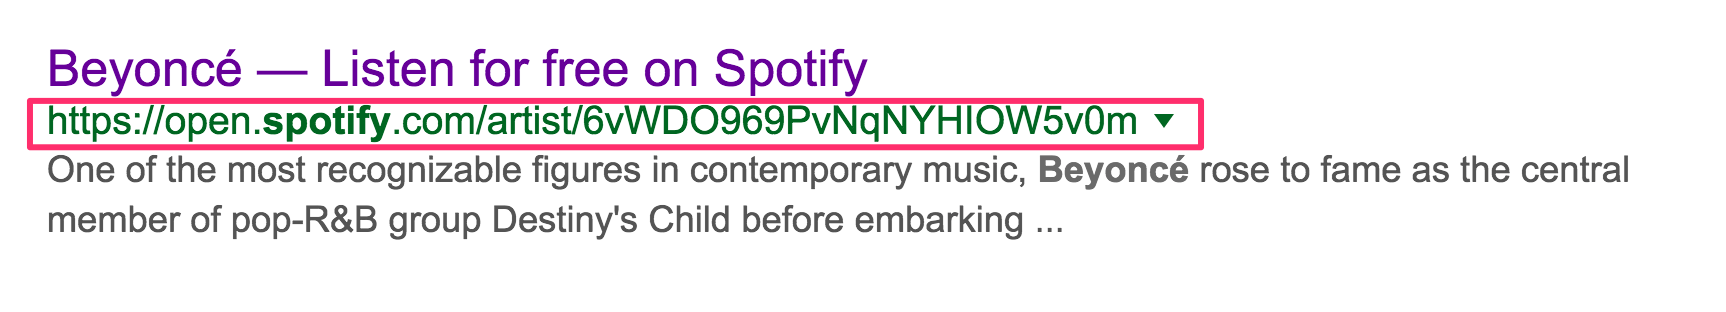 image-1-beyonce-google-serp